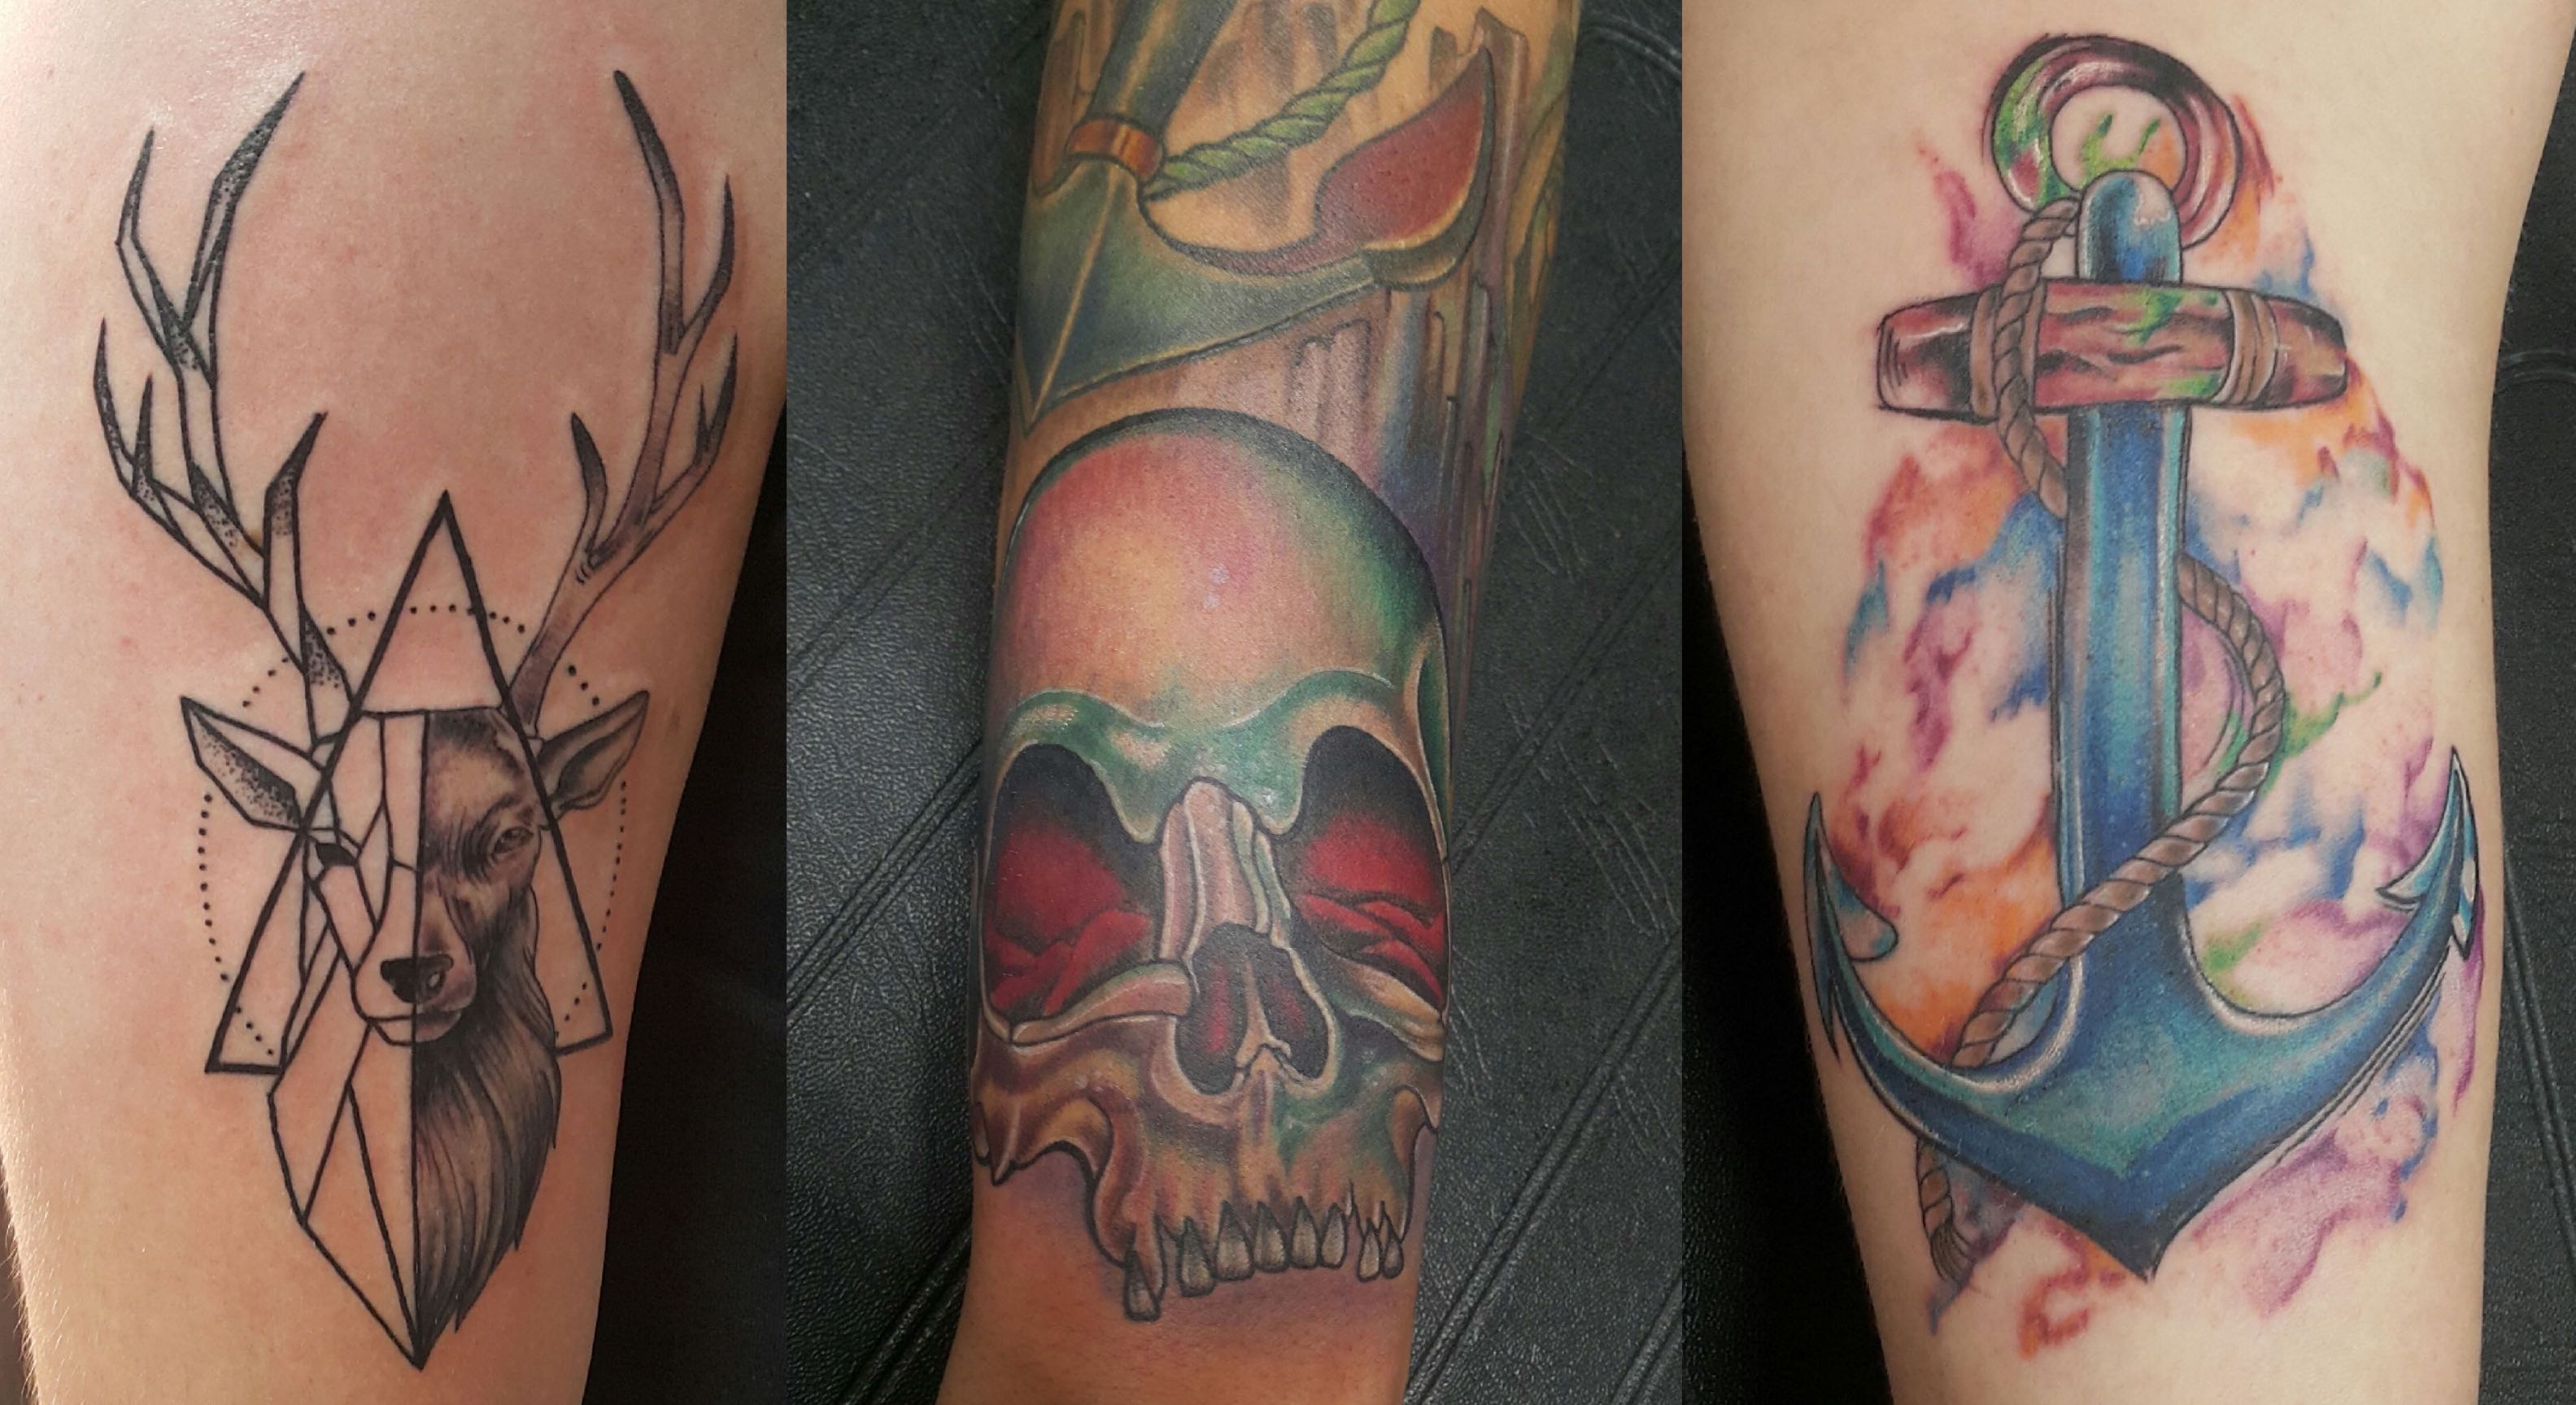 Tattoos down by Rudi Rautenbach of Inkaholic Tattoos